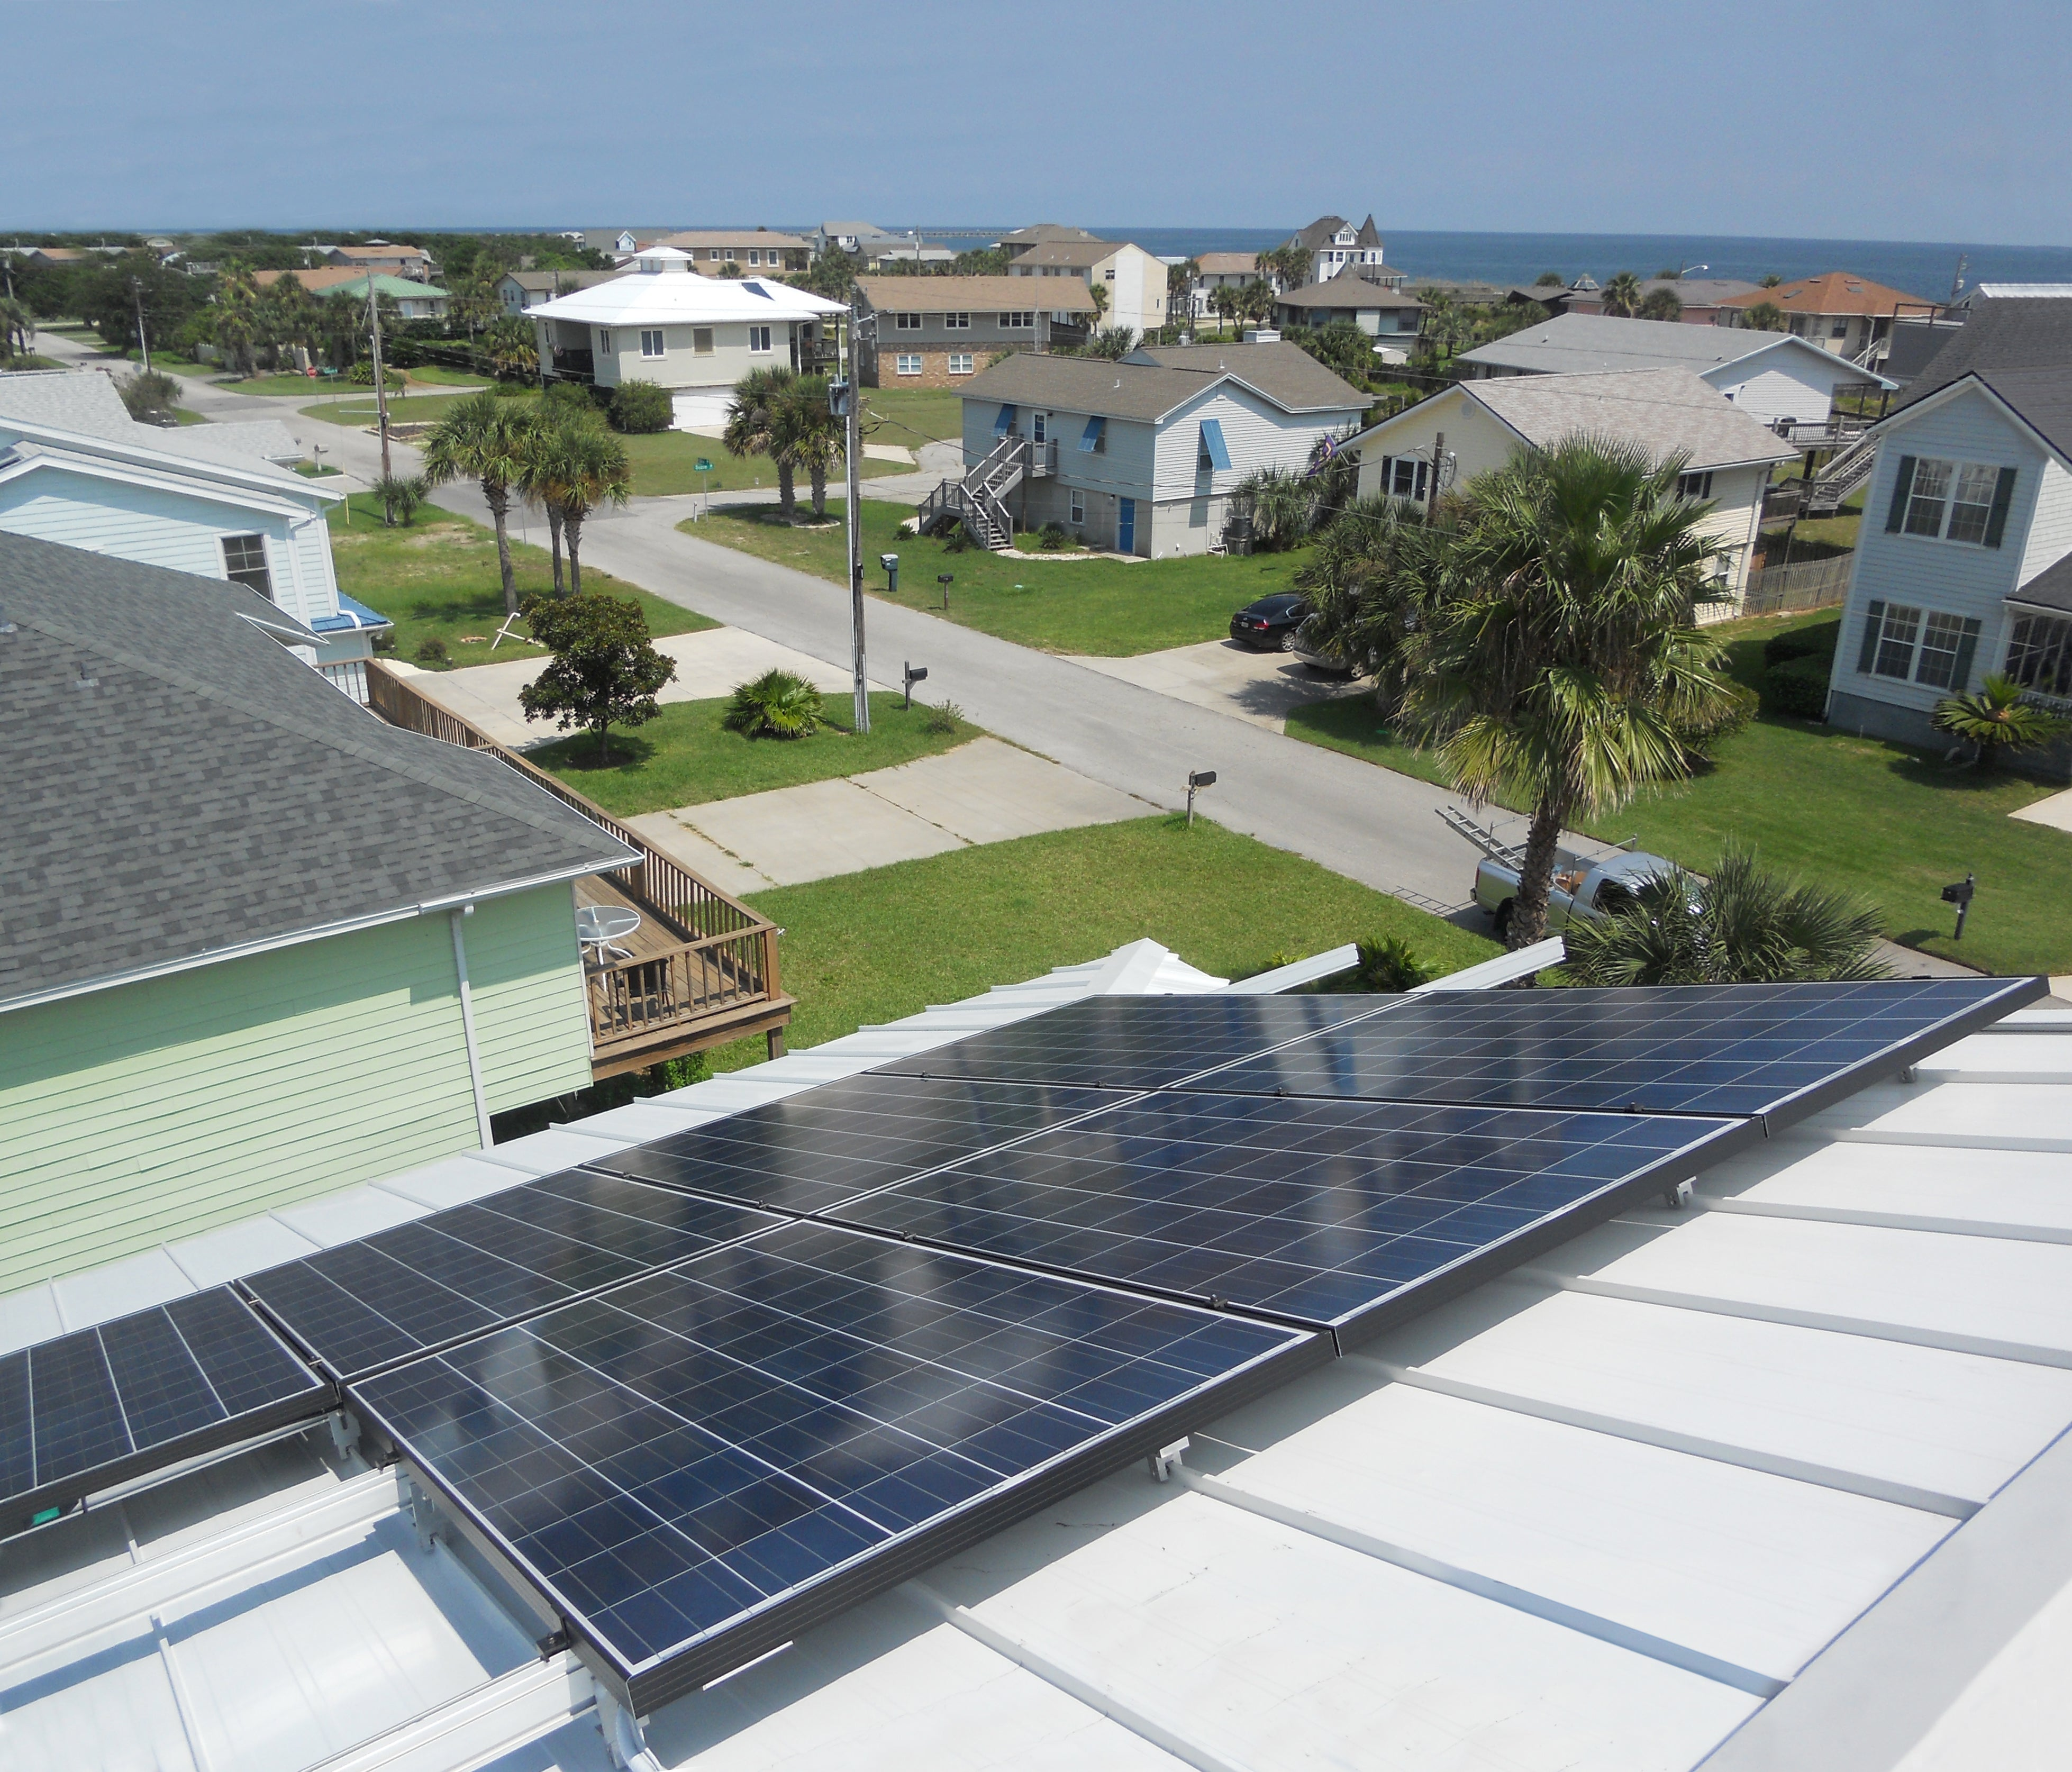 Ocean-side 9.25KW residential PV installation